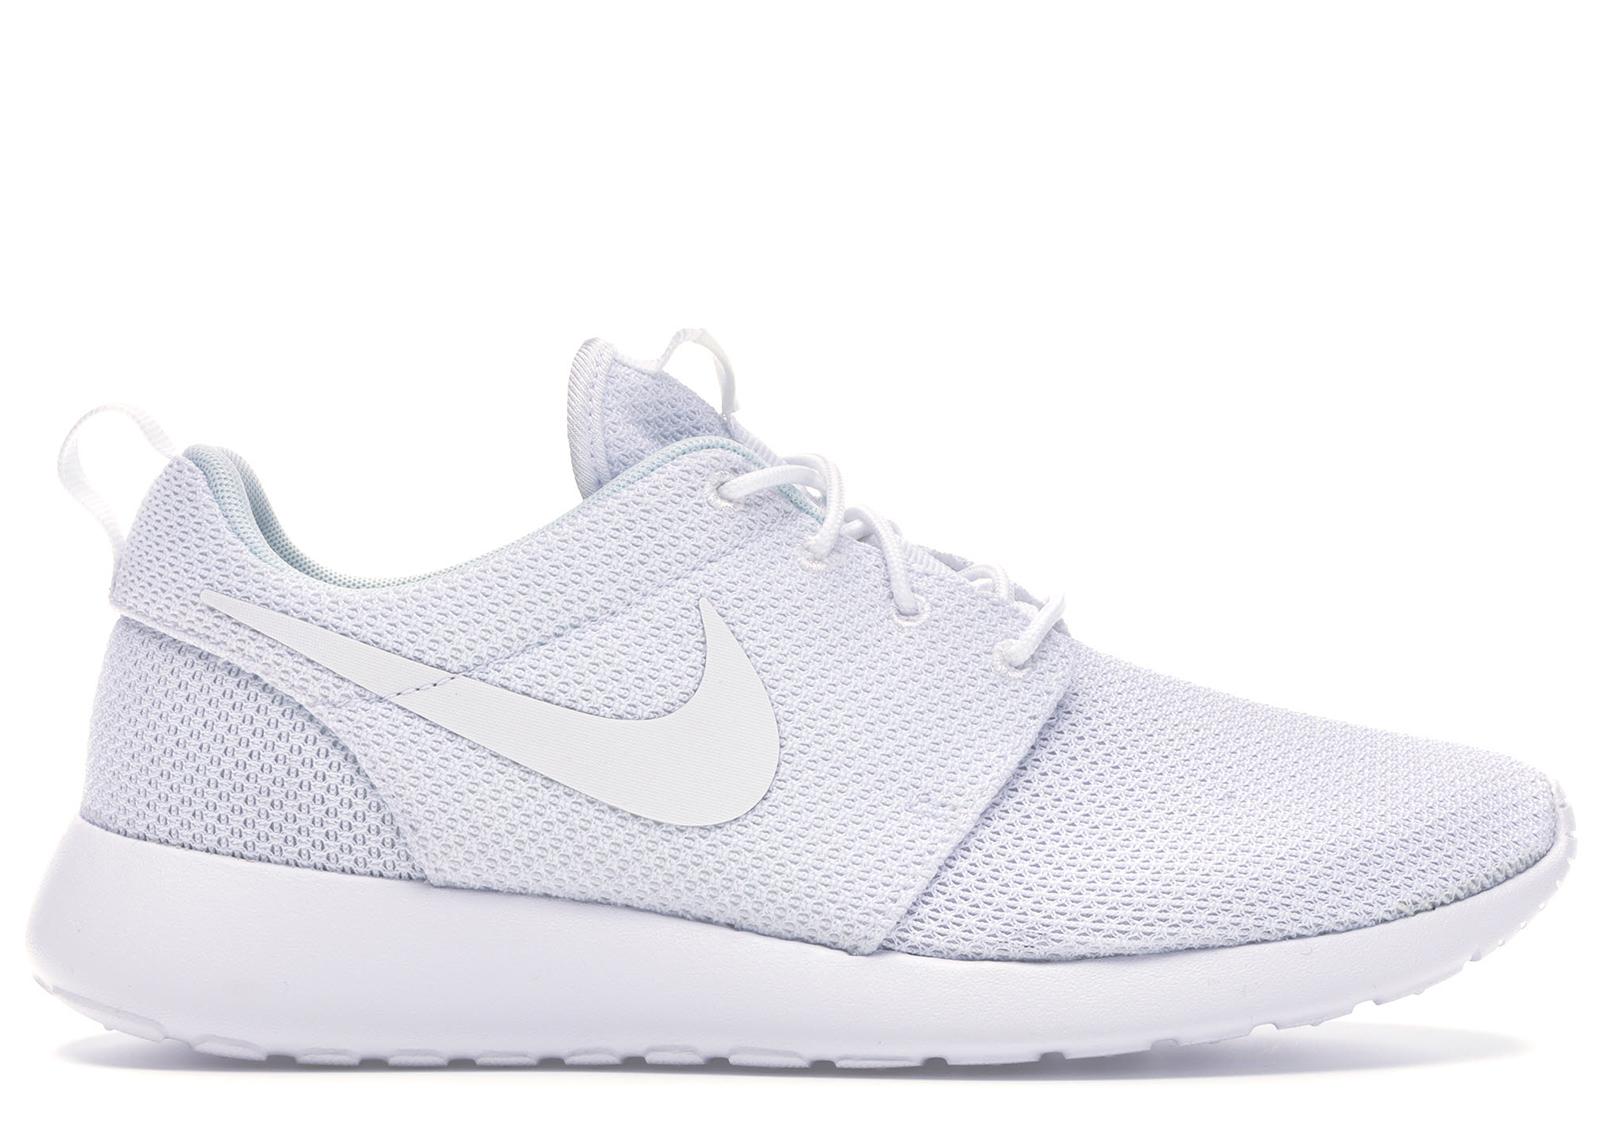 stockx.imgix.net/Nike-Roshe-One-White-White-Pro